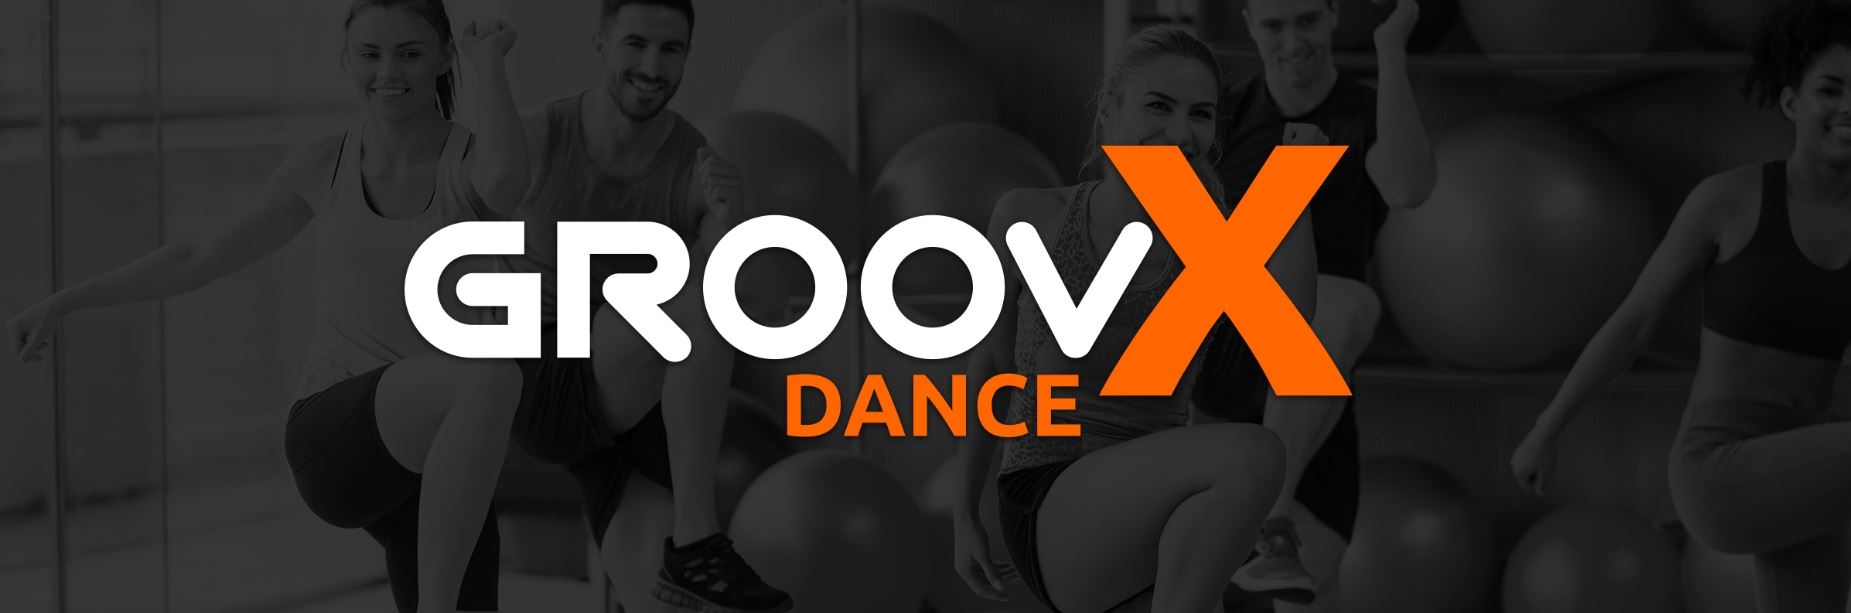 GroovX Dance logo Web